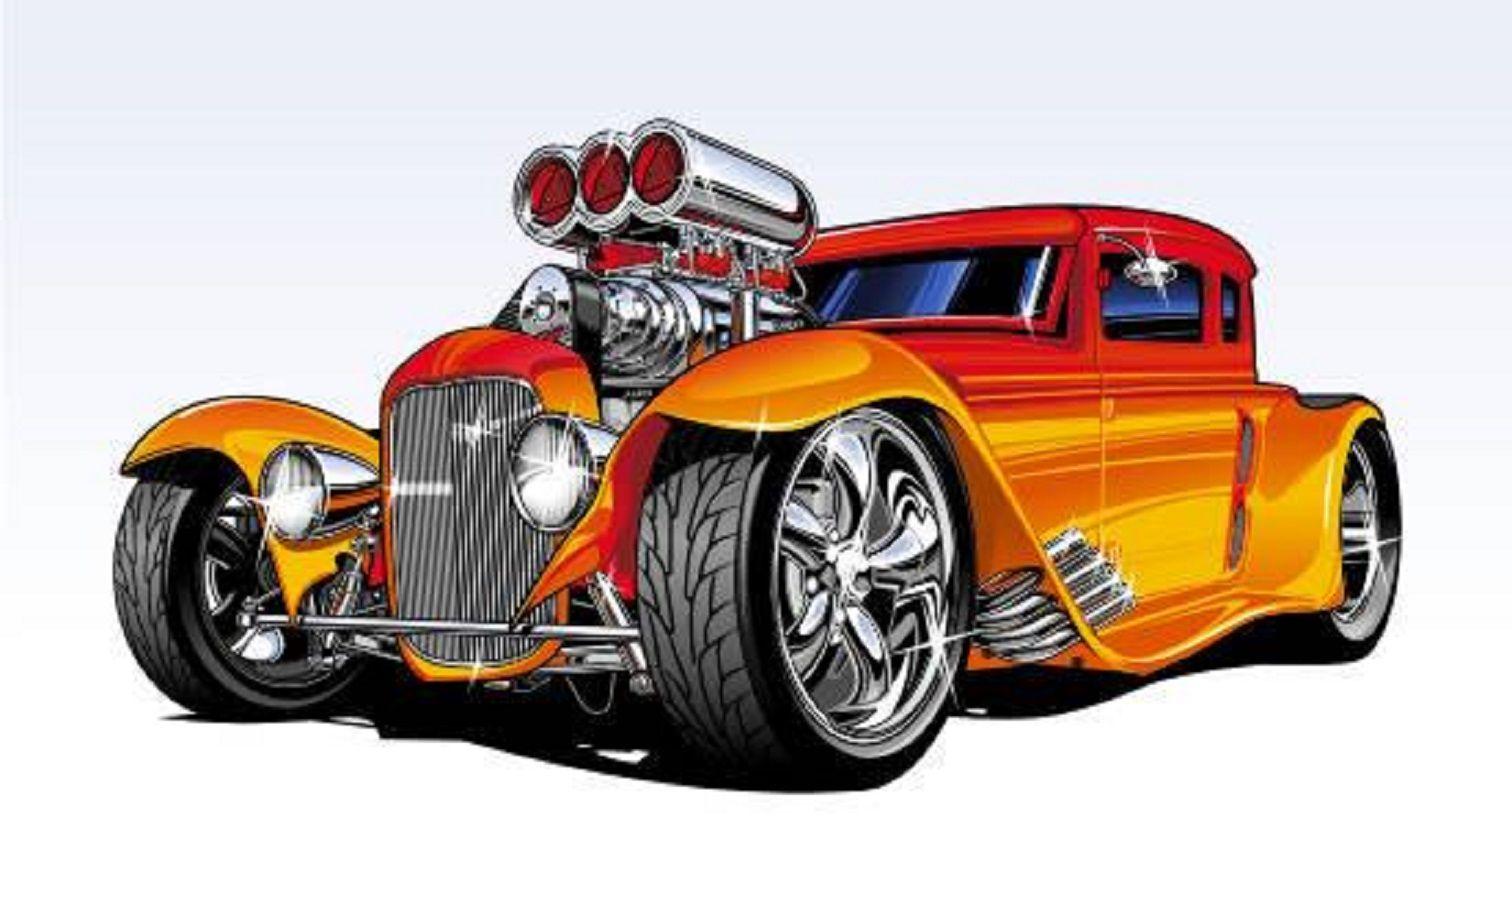 Krazy Kar Kartoon 78 art drawing of cars Pinterest